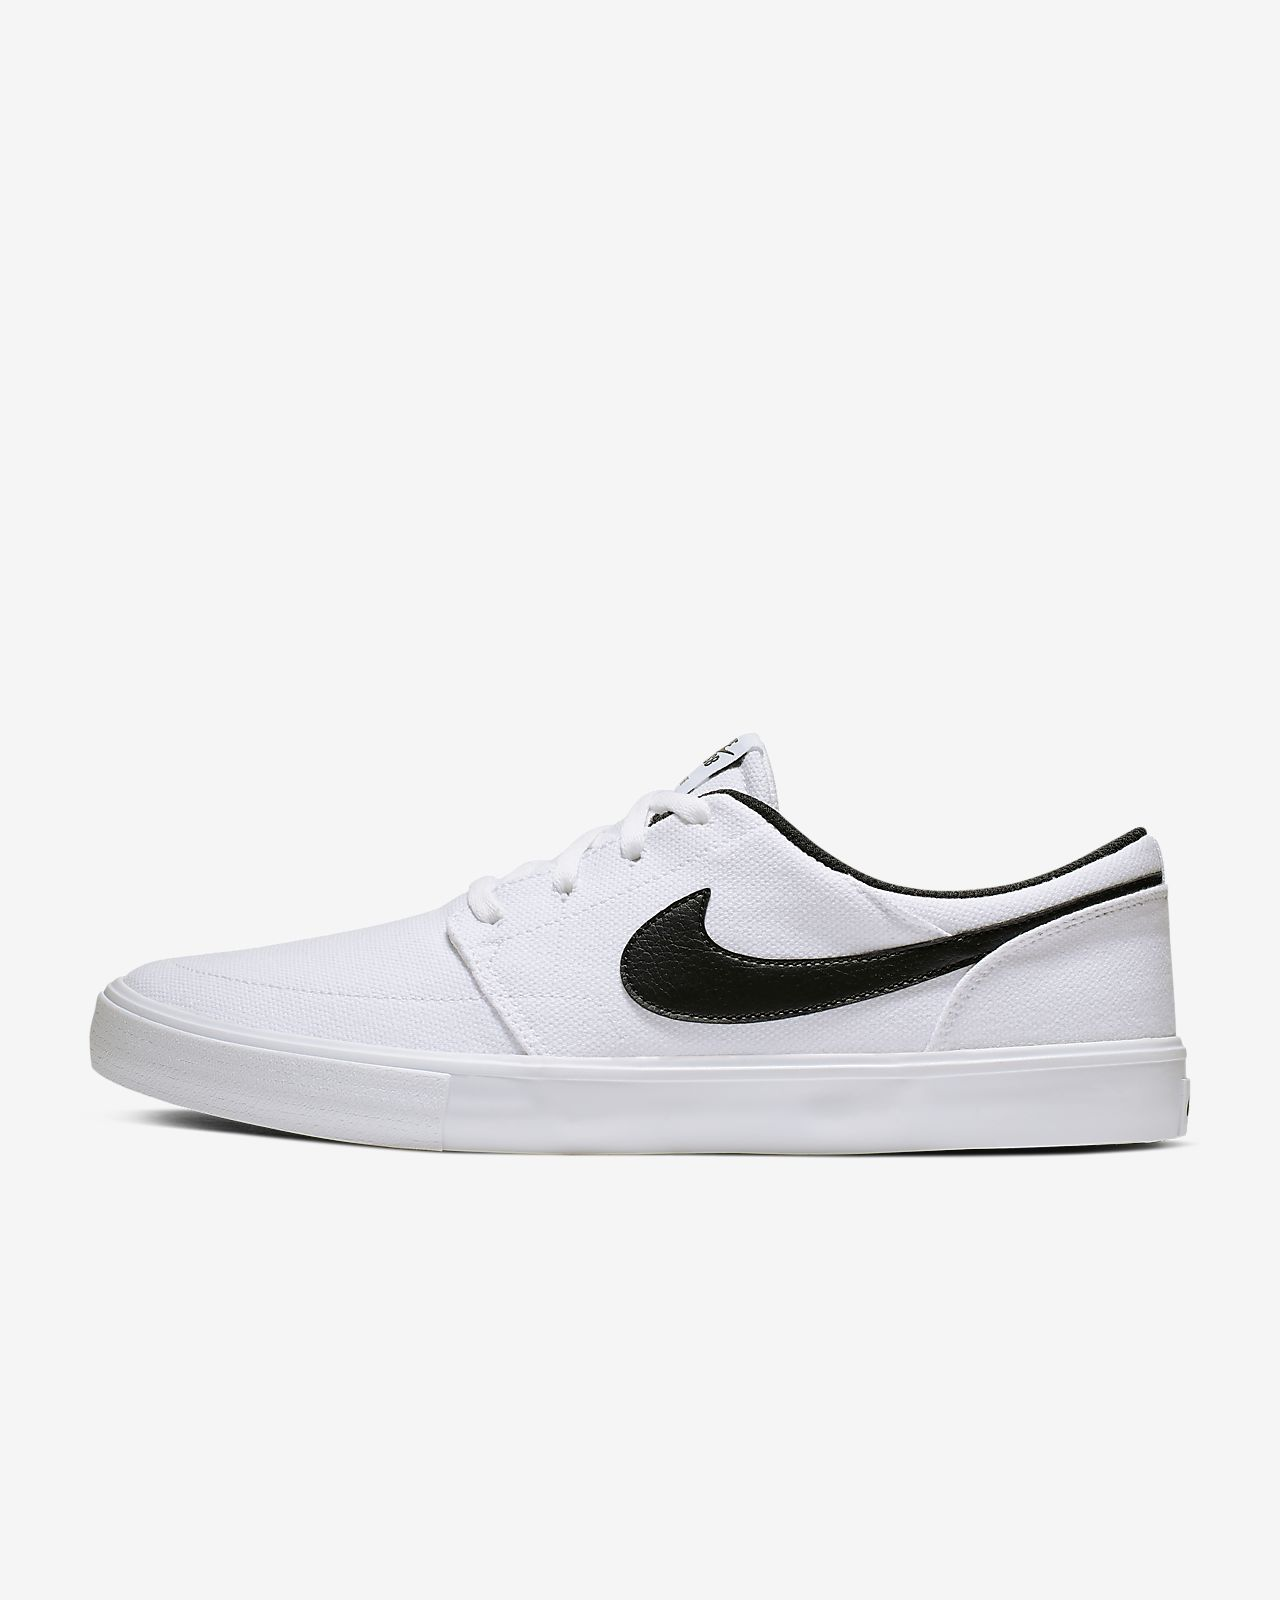 Nike SB Portmore II Solar CNVS男/女滑板鞋